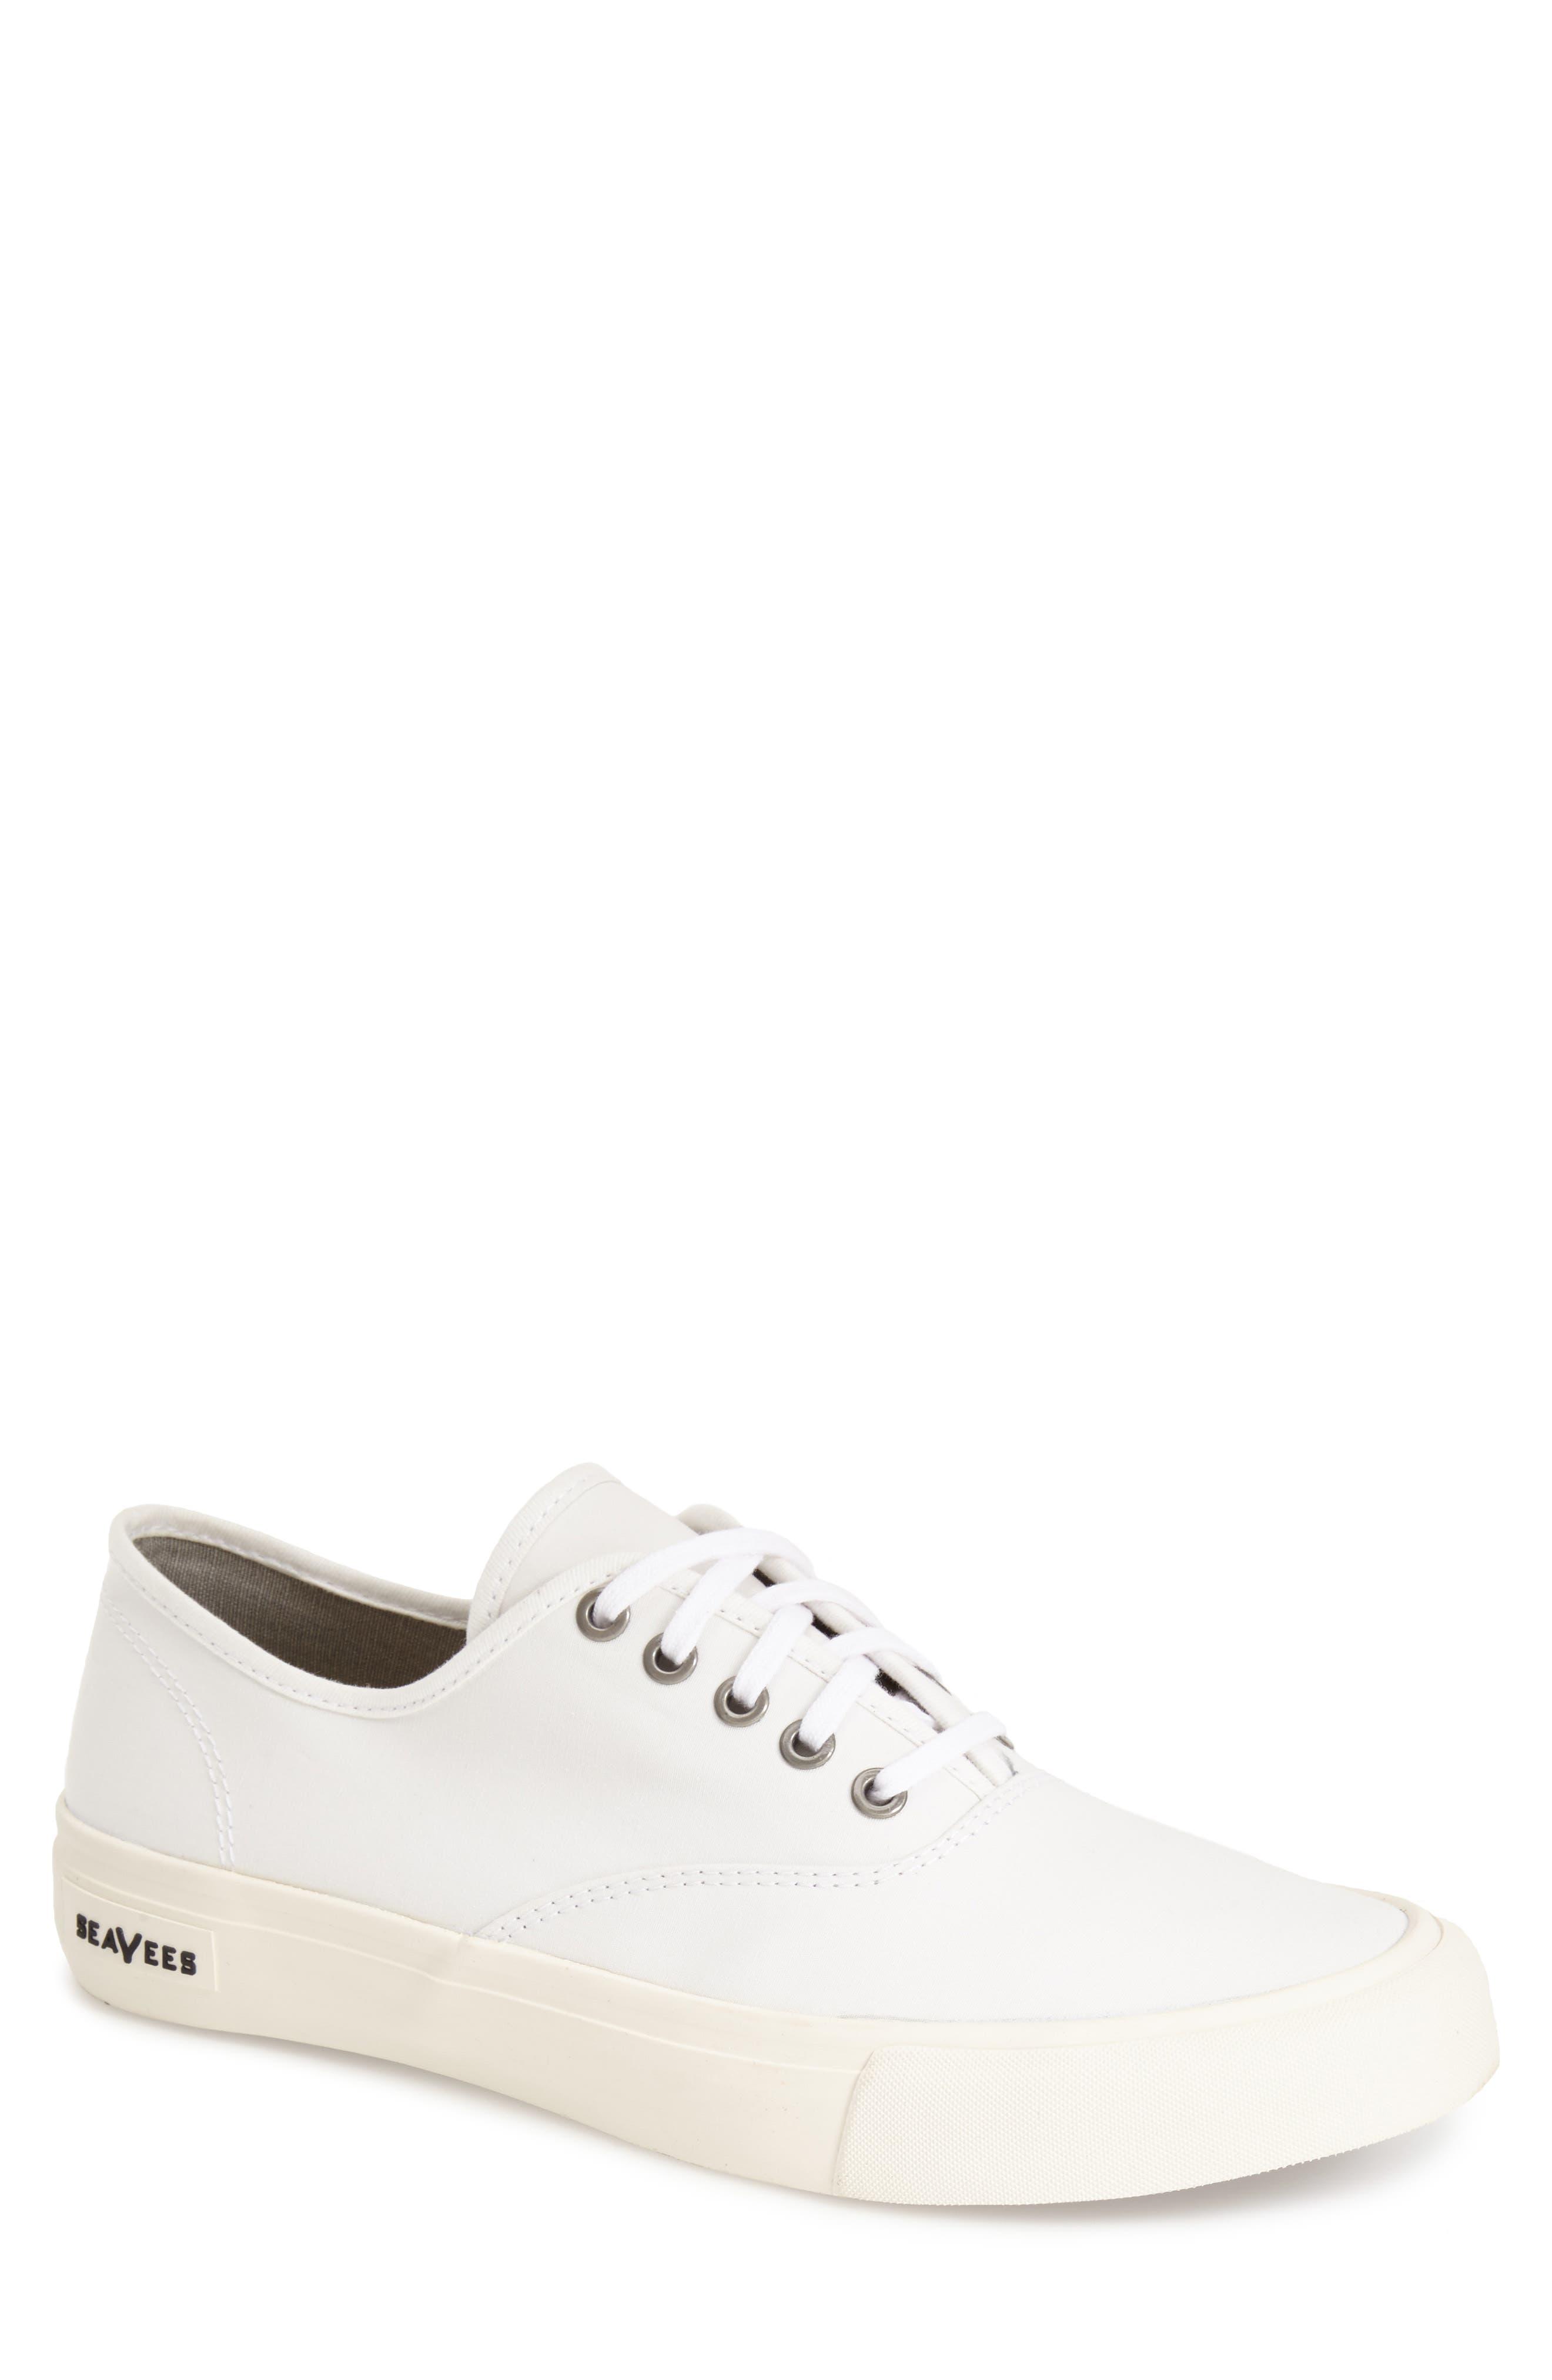 Legend Standard Sneaker,                         Main,                         color, BLEACH